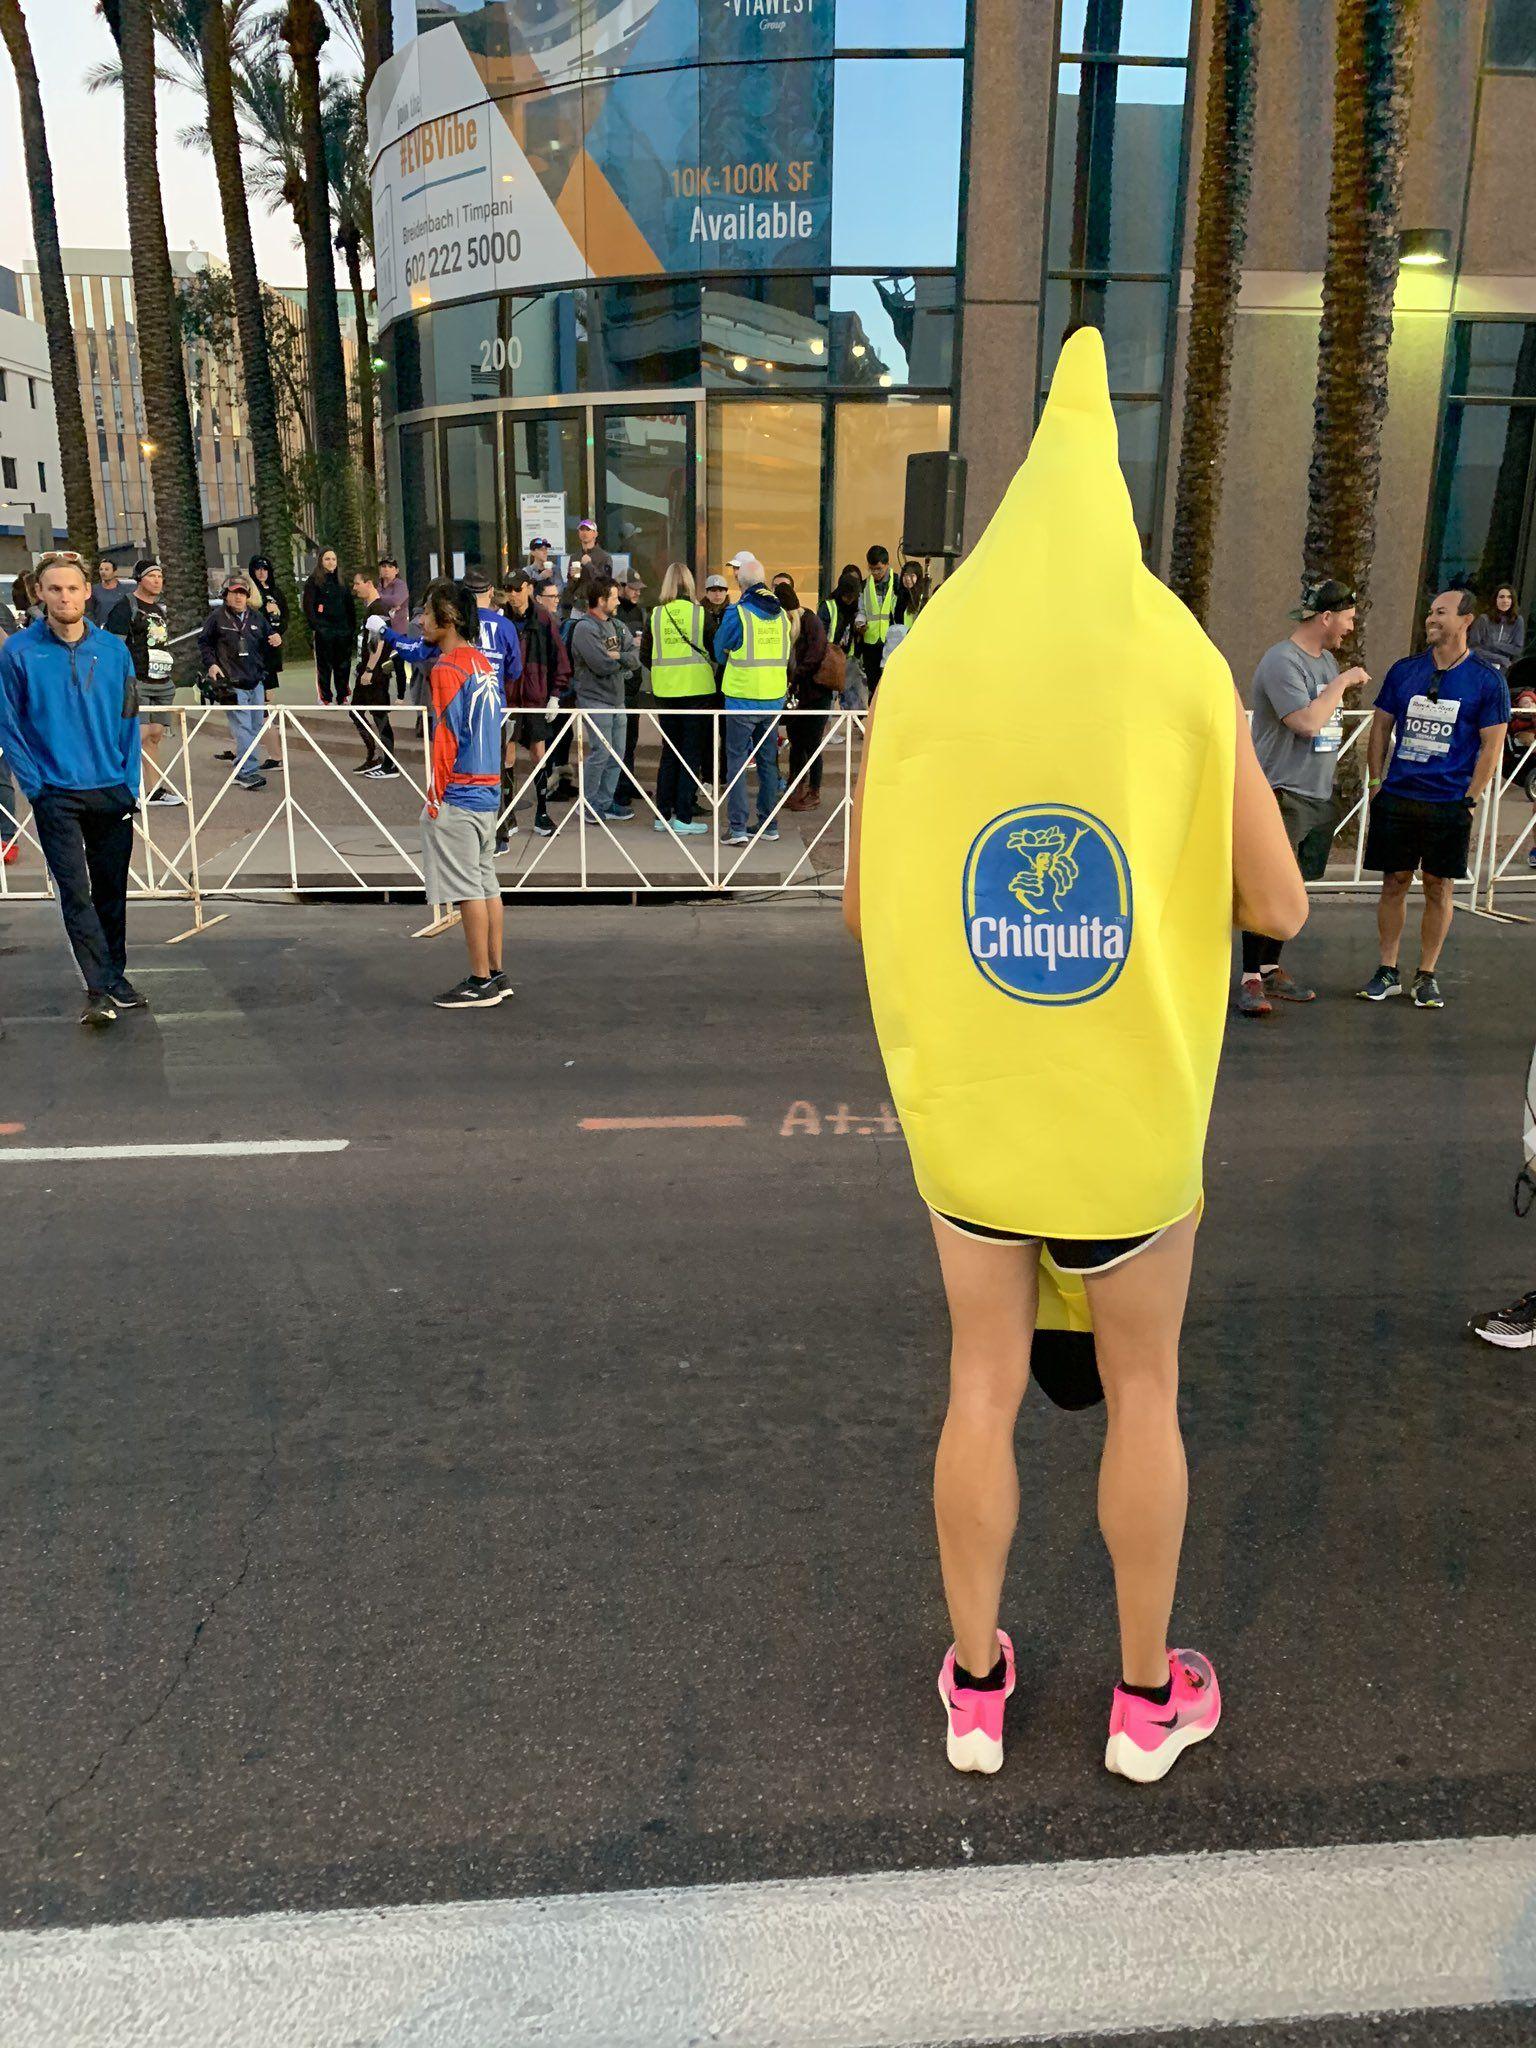 Man runs 2:41 marathon, dressed in a banana suit